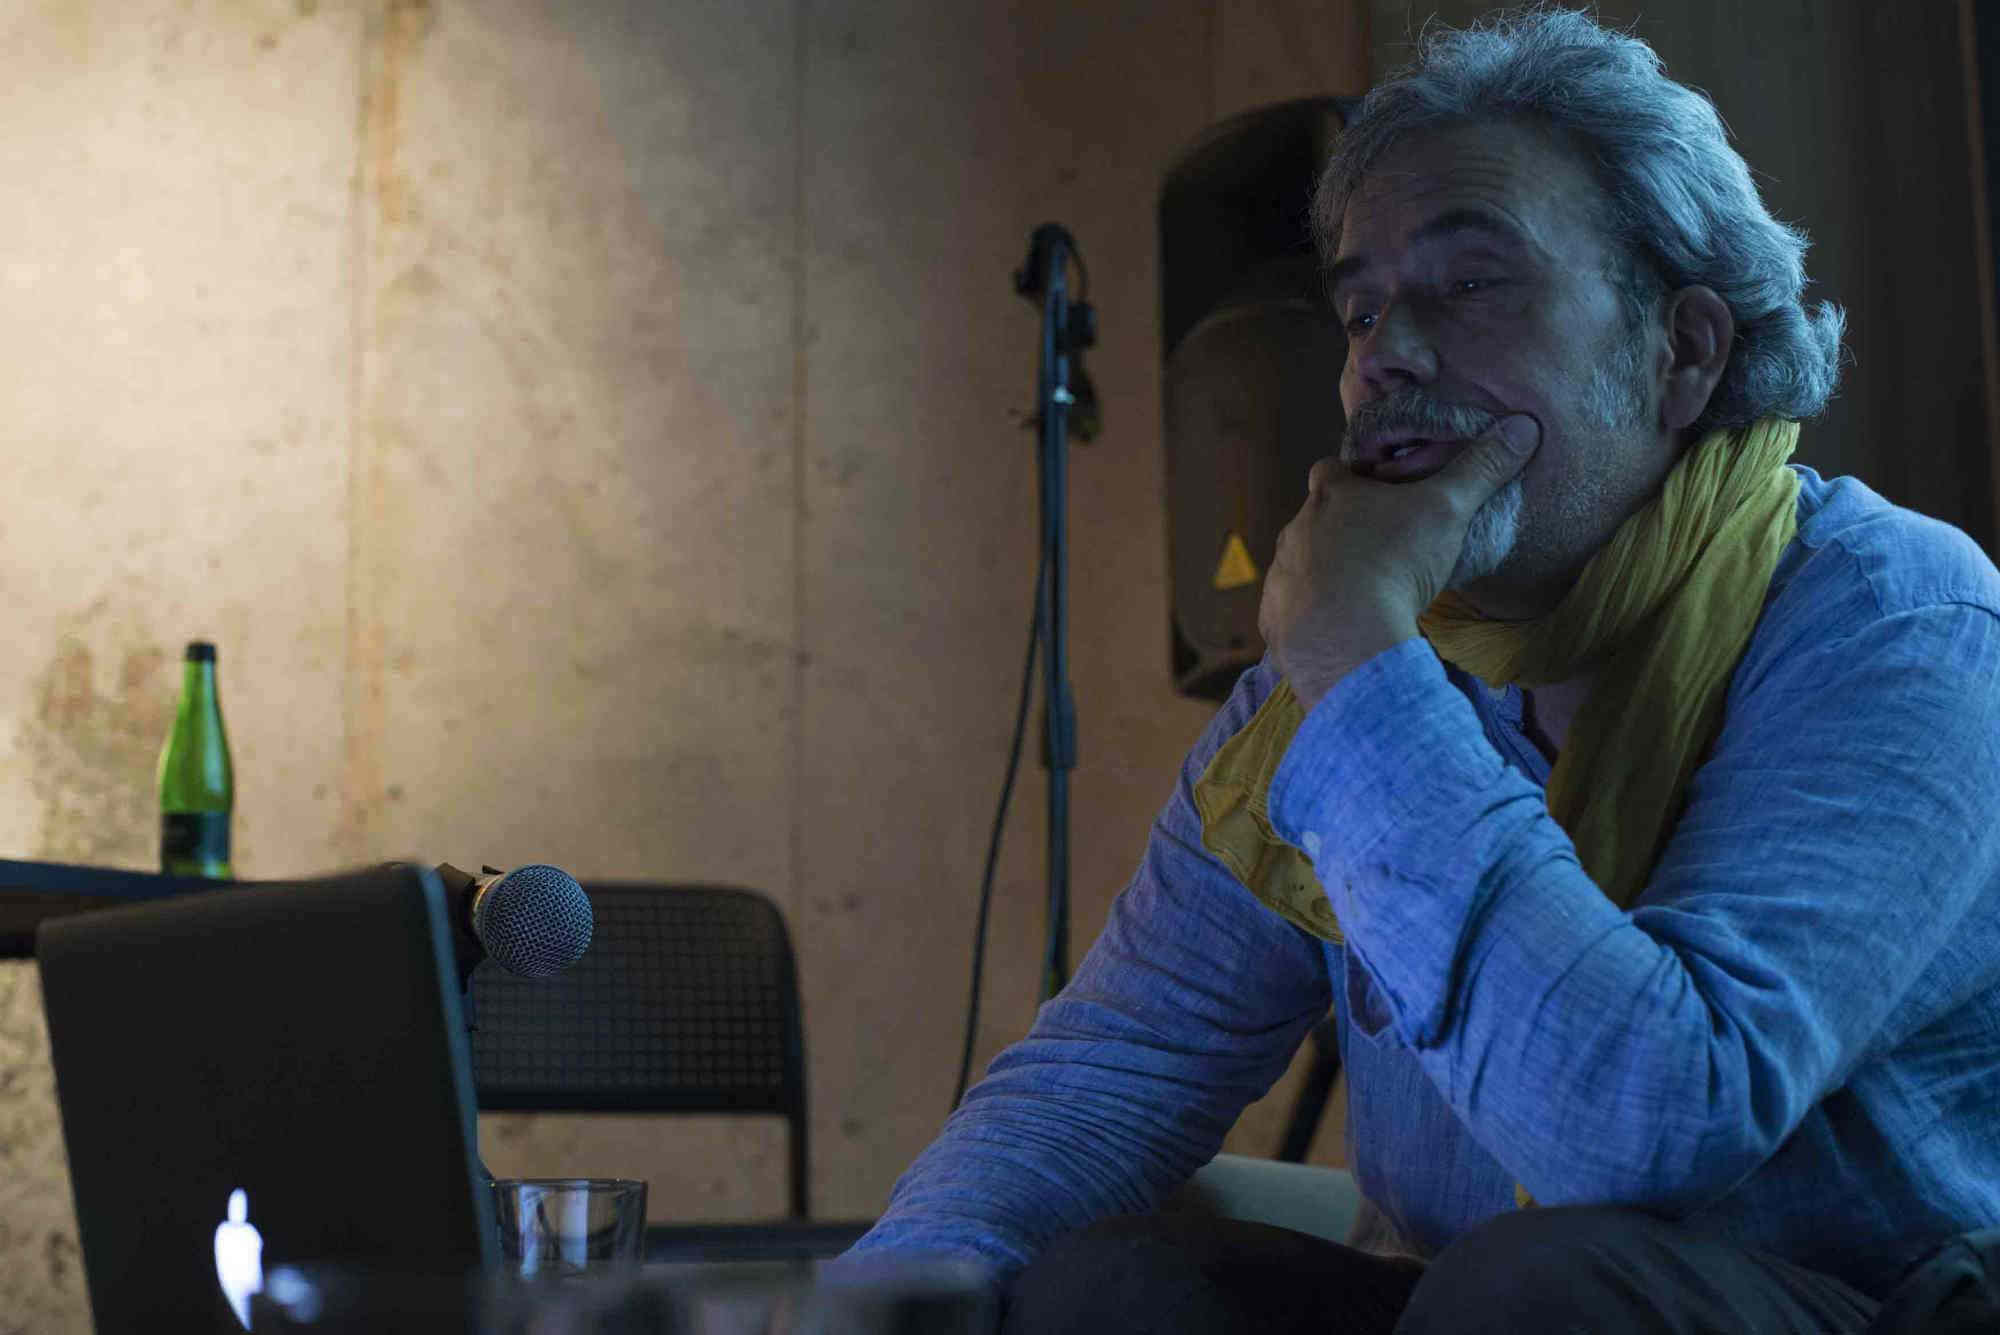 Diálogo con Pepe Guzmán en FIFV 2016. ©Ignacio Lamas